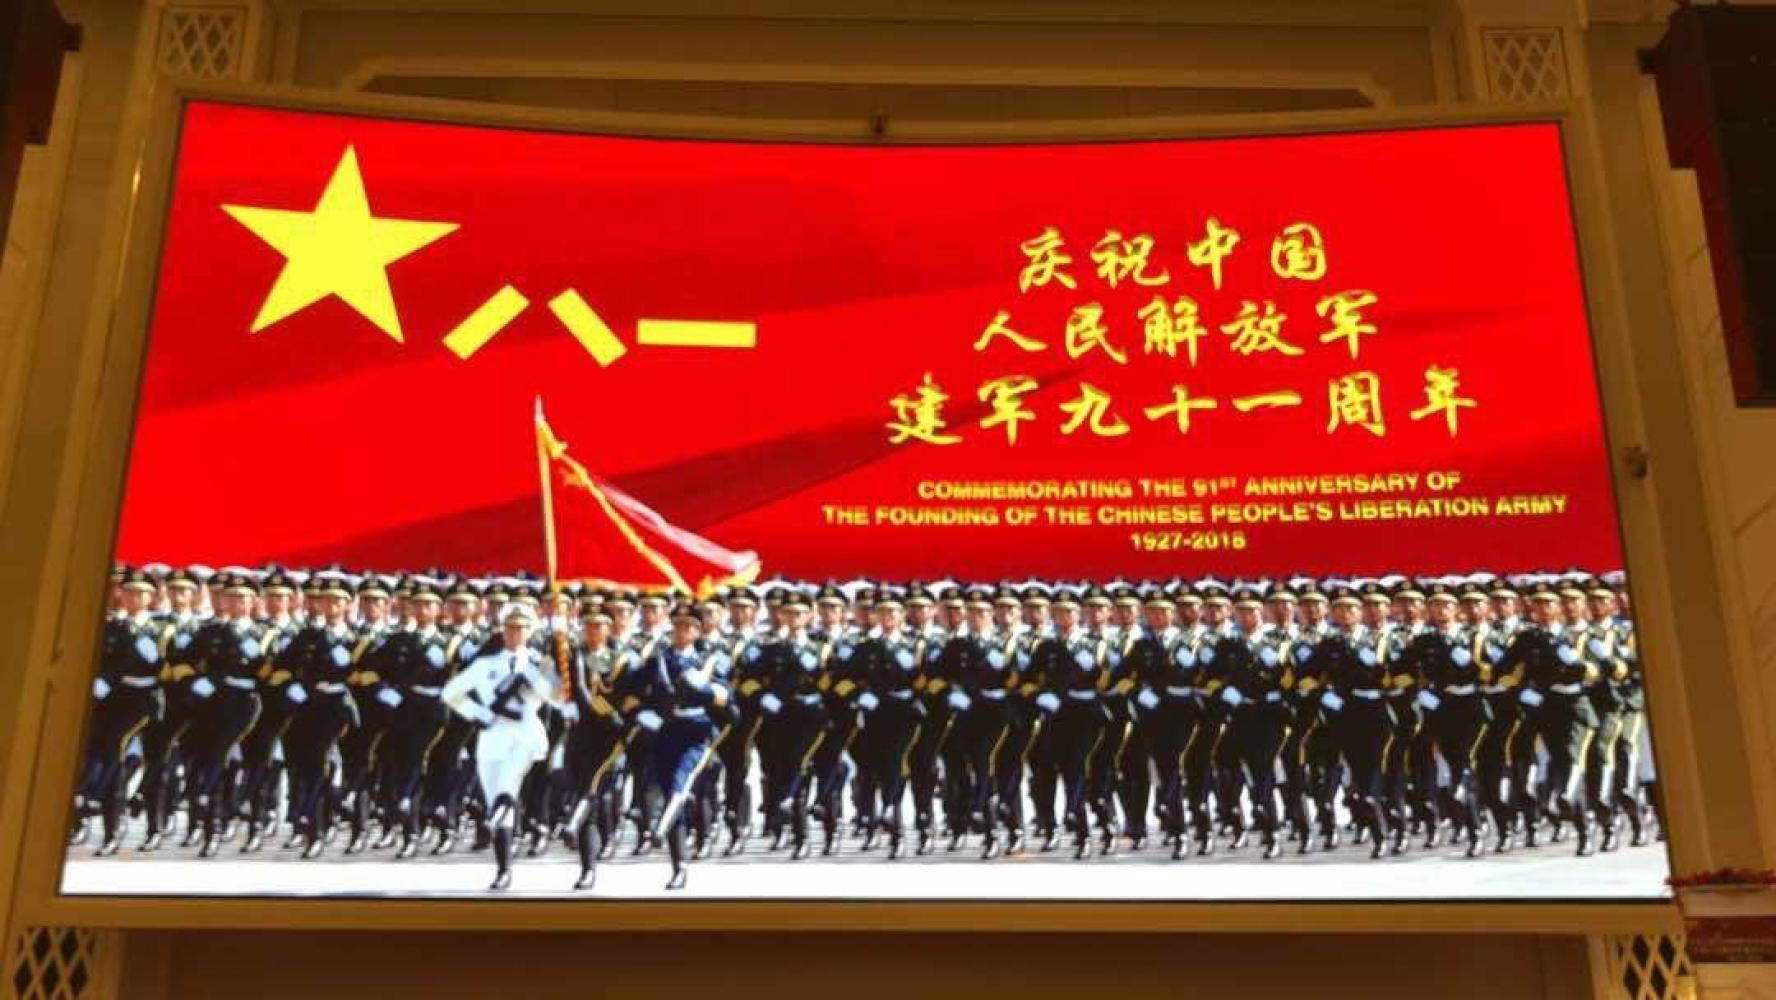 集团CEO受邀出席中国人民解放军建军91周年酒会 GTC Group invited to cocktail dinner of 91th Anniversary of Chinese PLA.